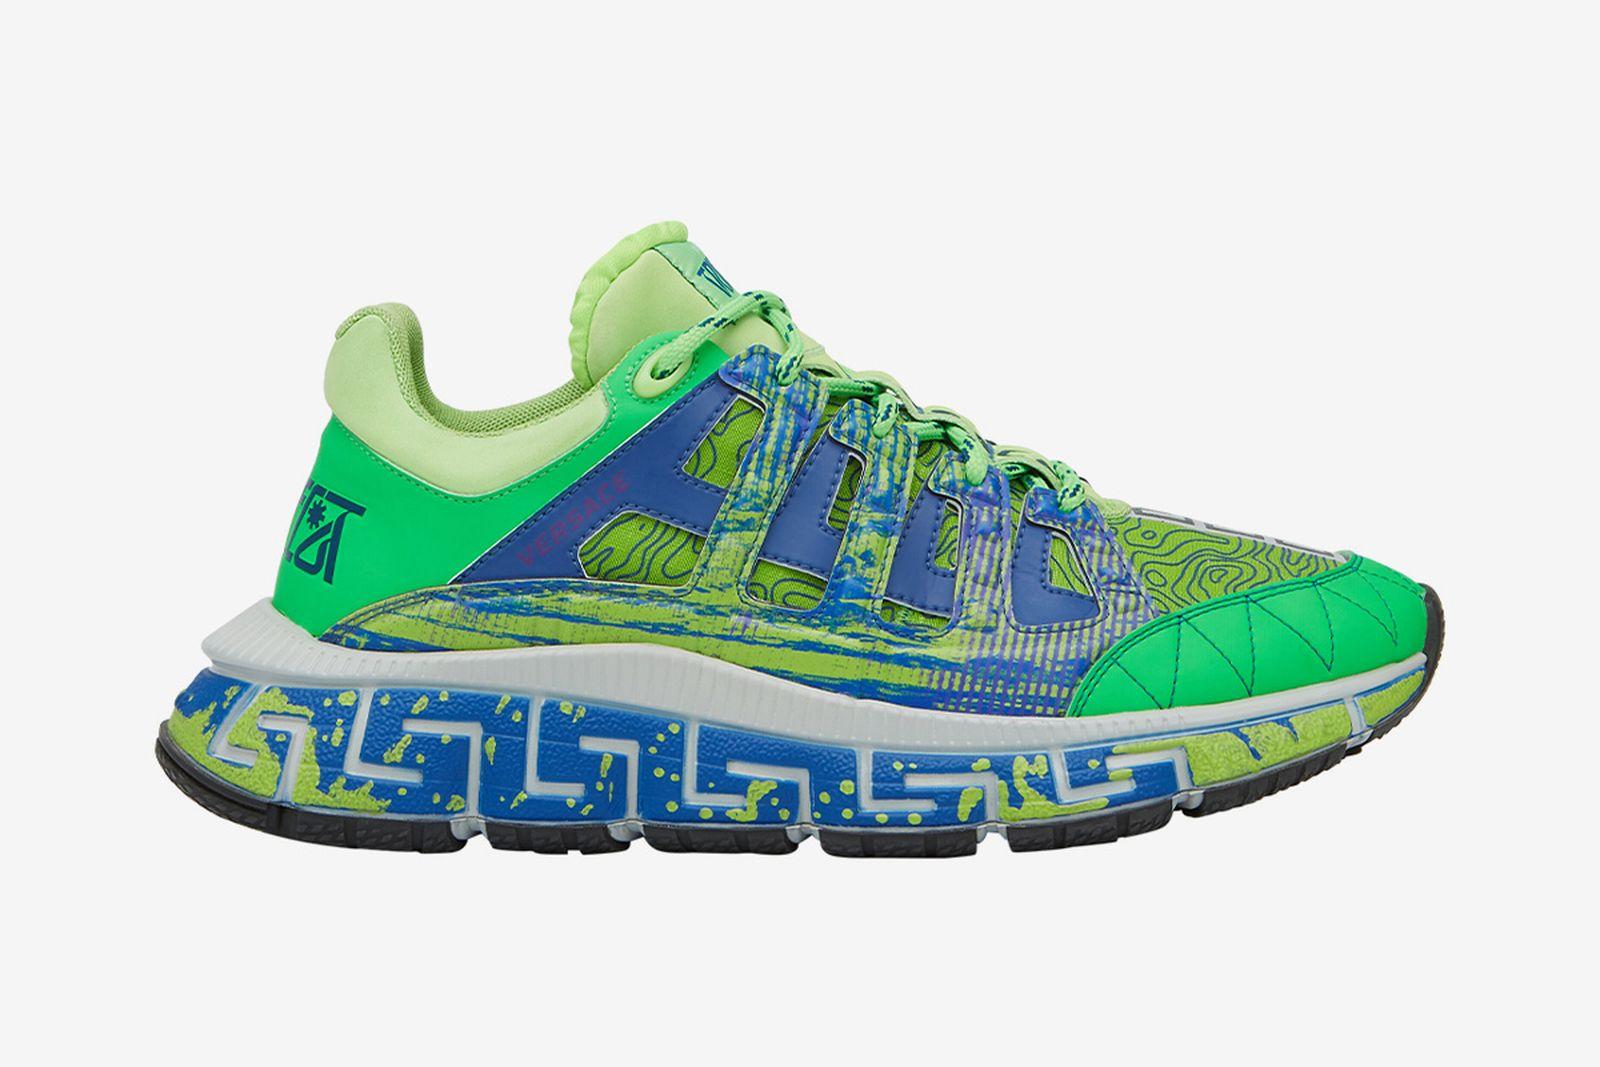 versace-trigreca-sneaker-release-date-price-01